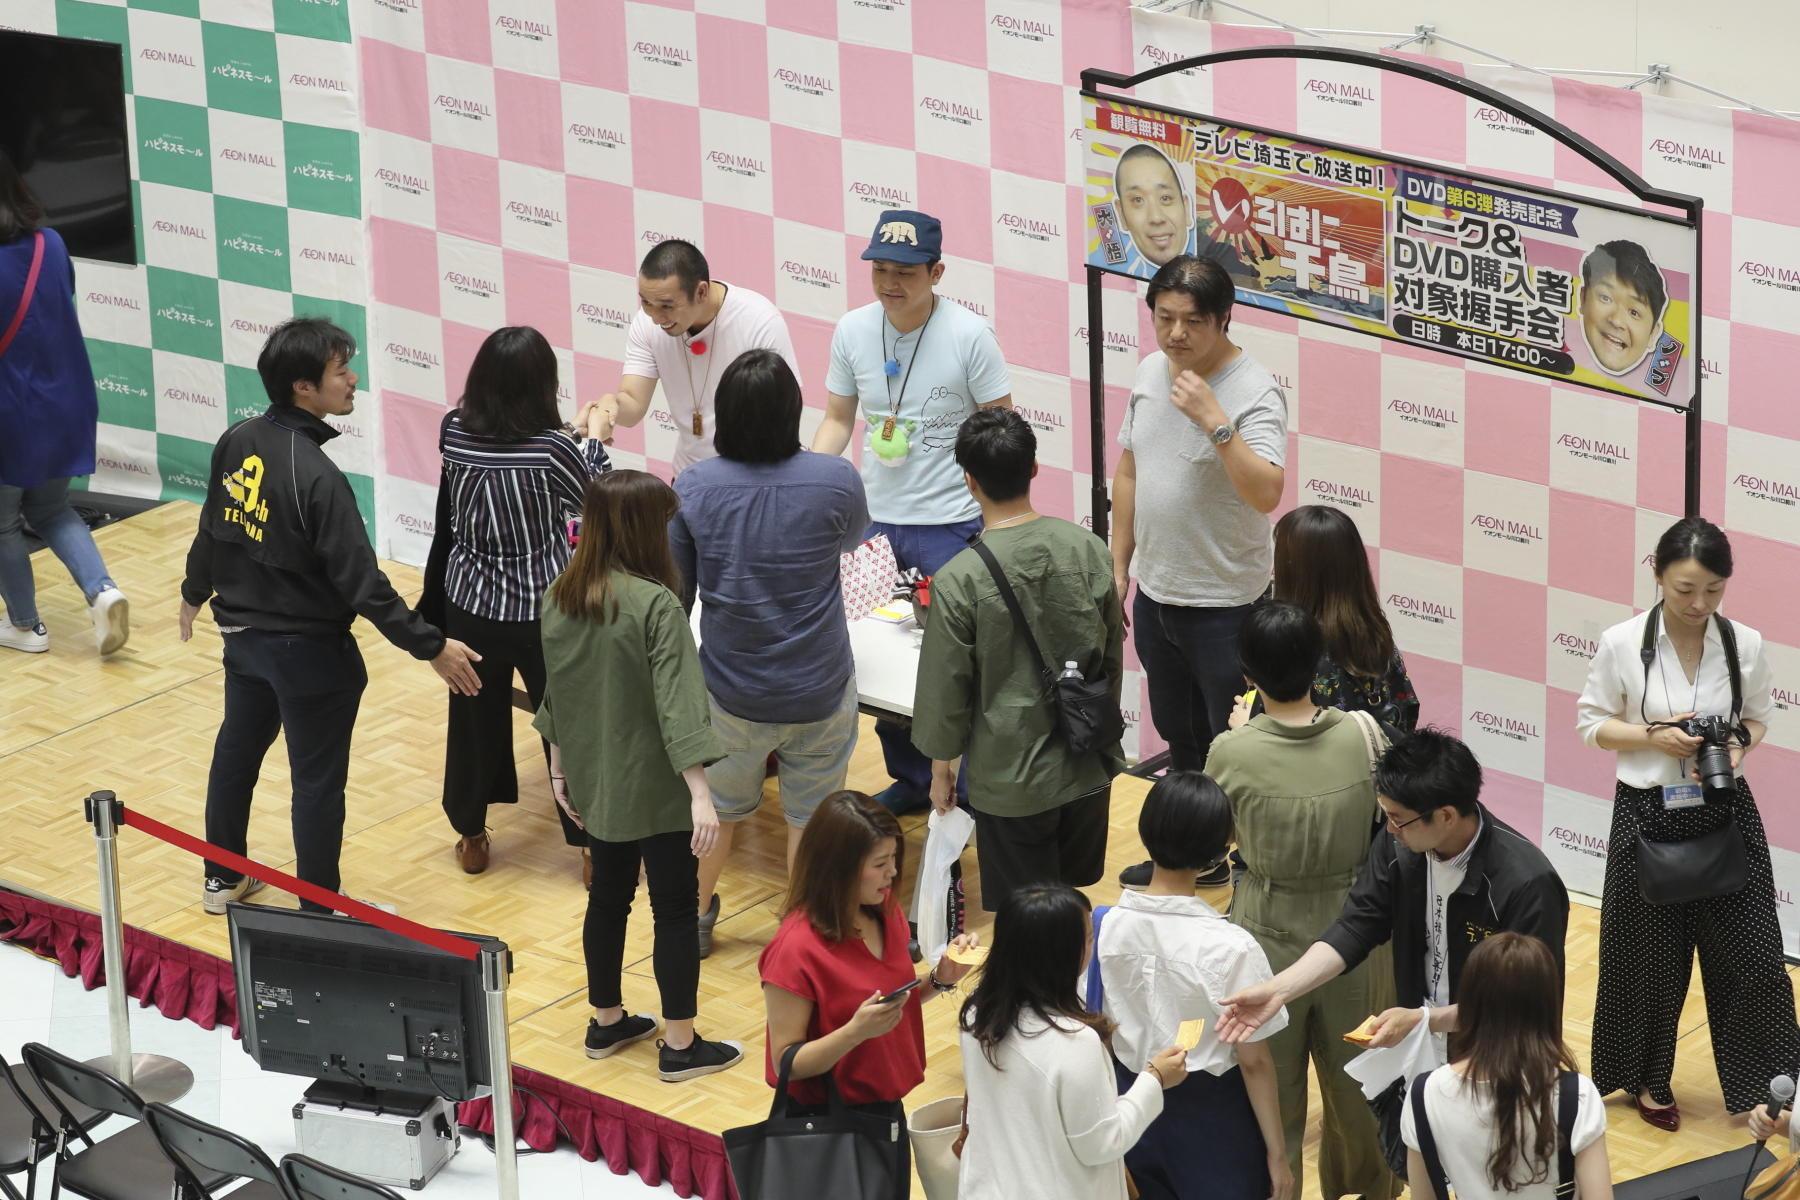 http://news.yoshimoto.co.jp/20180531130457-54043f3efab0c5bac2175dd0eb982a9795c33b17.jpg